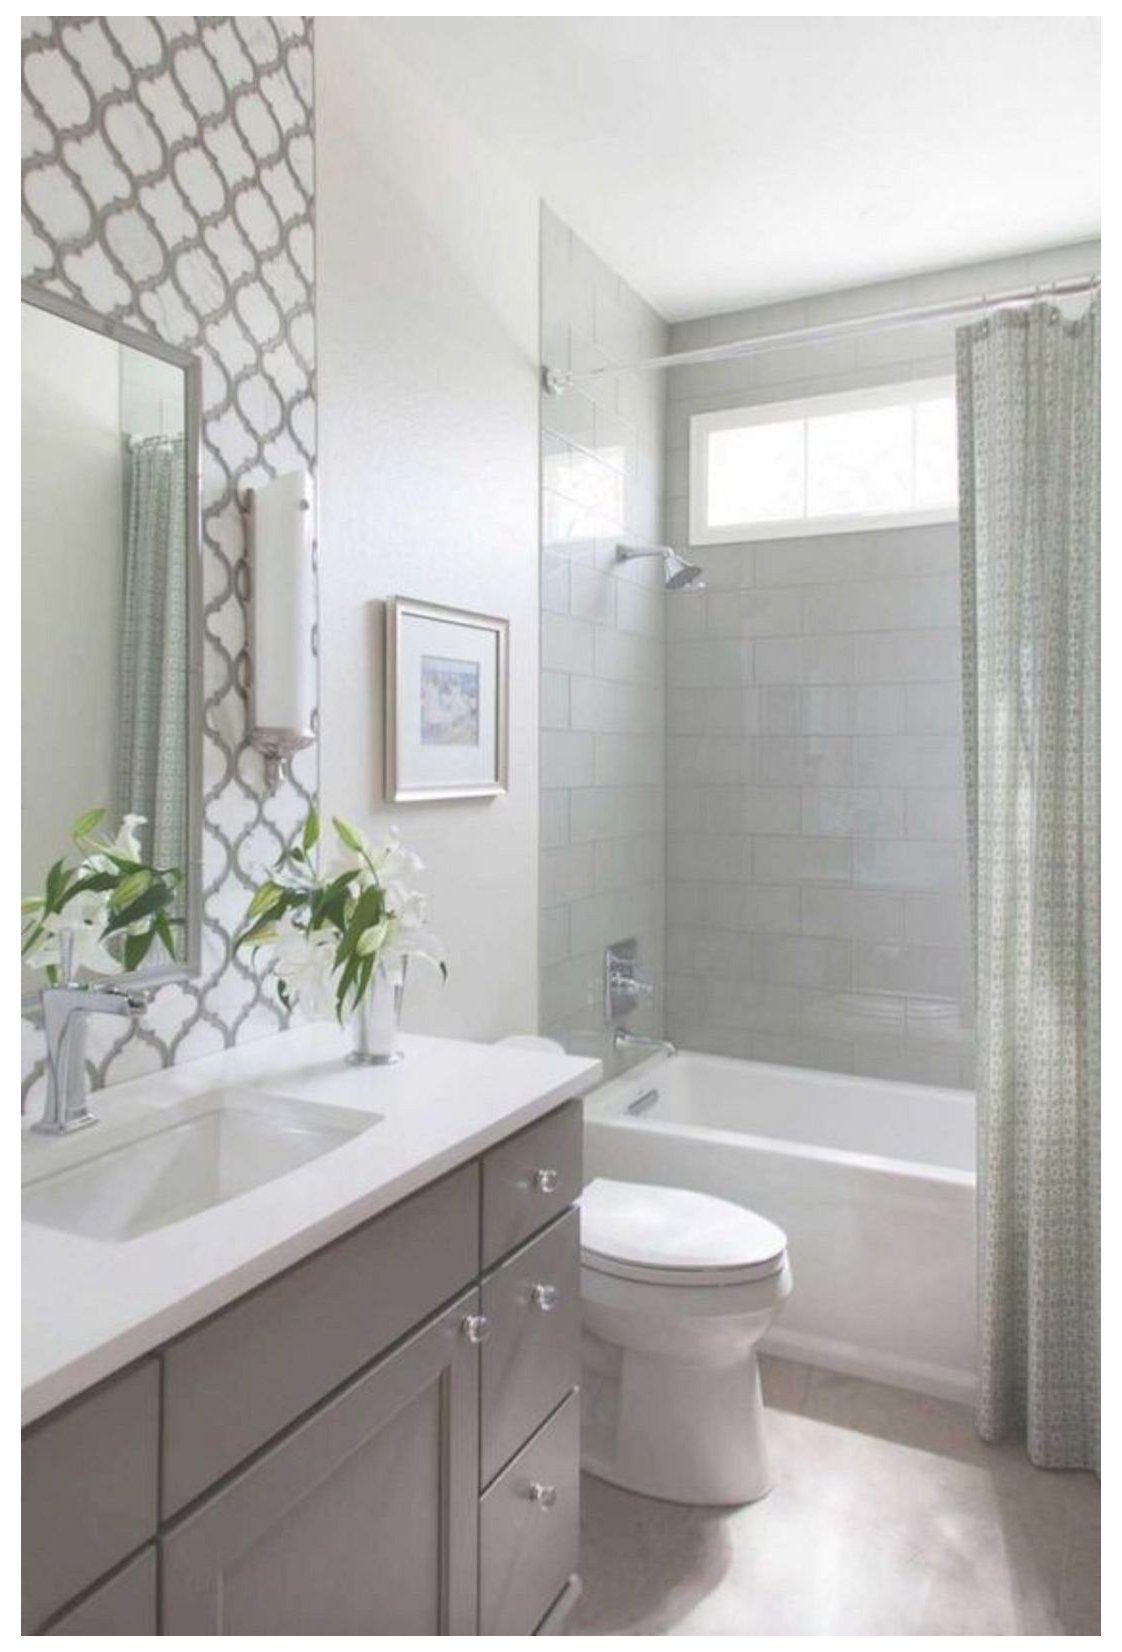 16 Small Bathroom Renovation Ideas 6508 Bathroom Remodel Bathroomremodel Small Bathr In 2020 Bathroom Tub Shower Combo Cheap Bathroom Remodel Small Shower Remodel